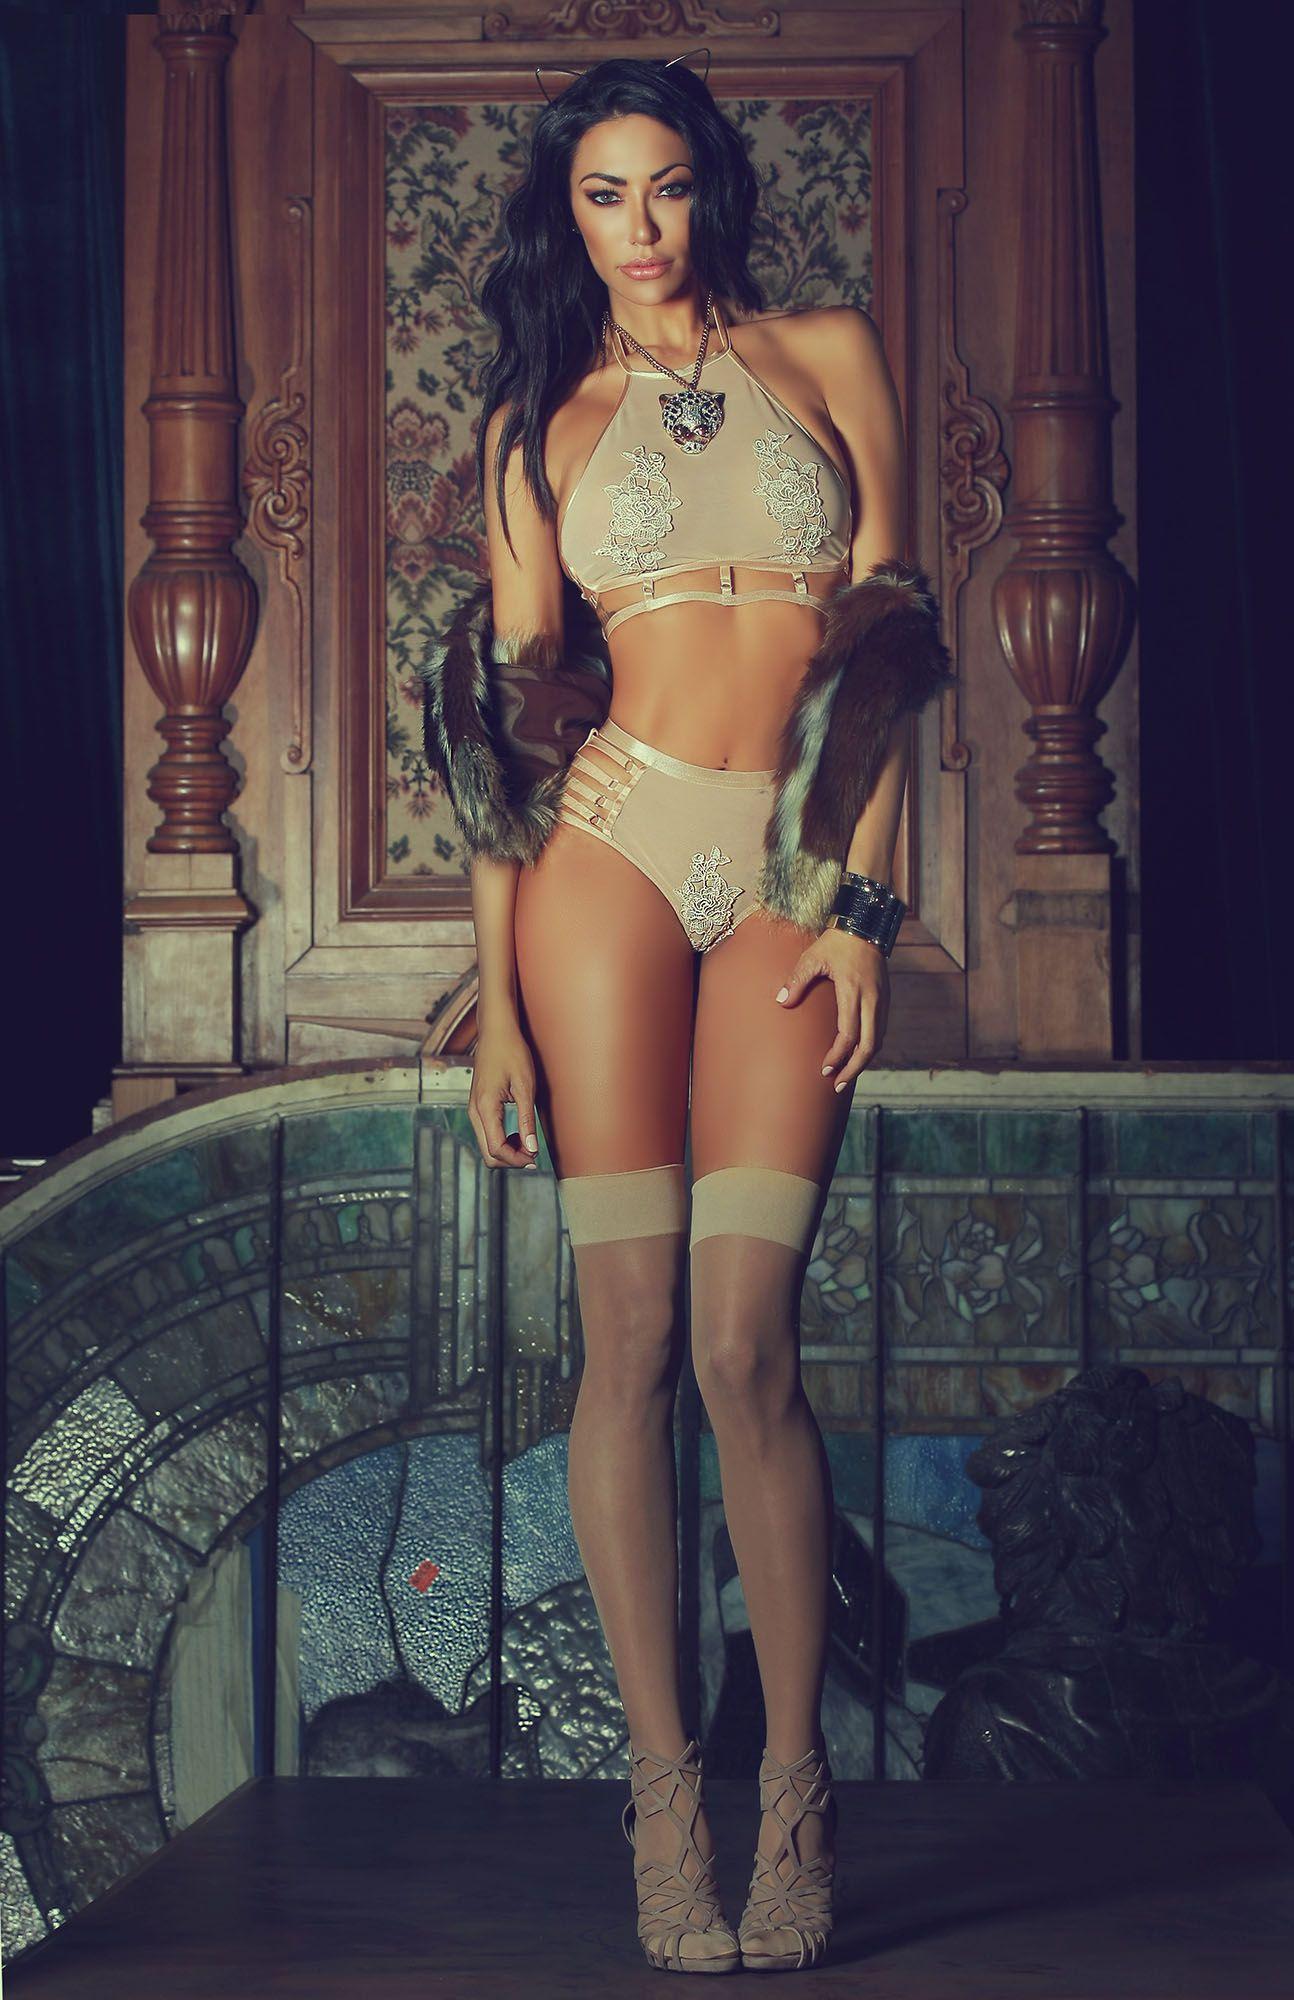 Forum on this topic: Chelsea handler topless 5 pics gif, tatiania-eriksen-hot/